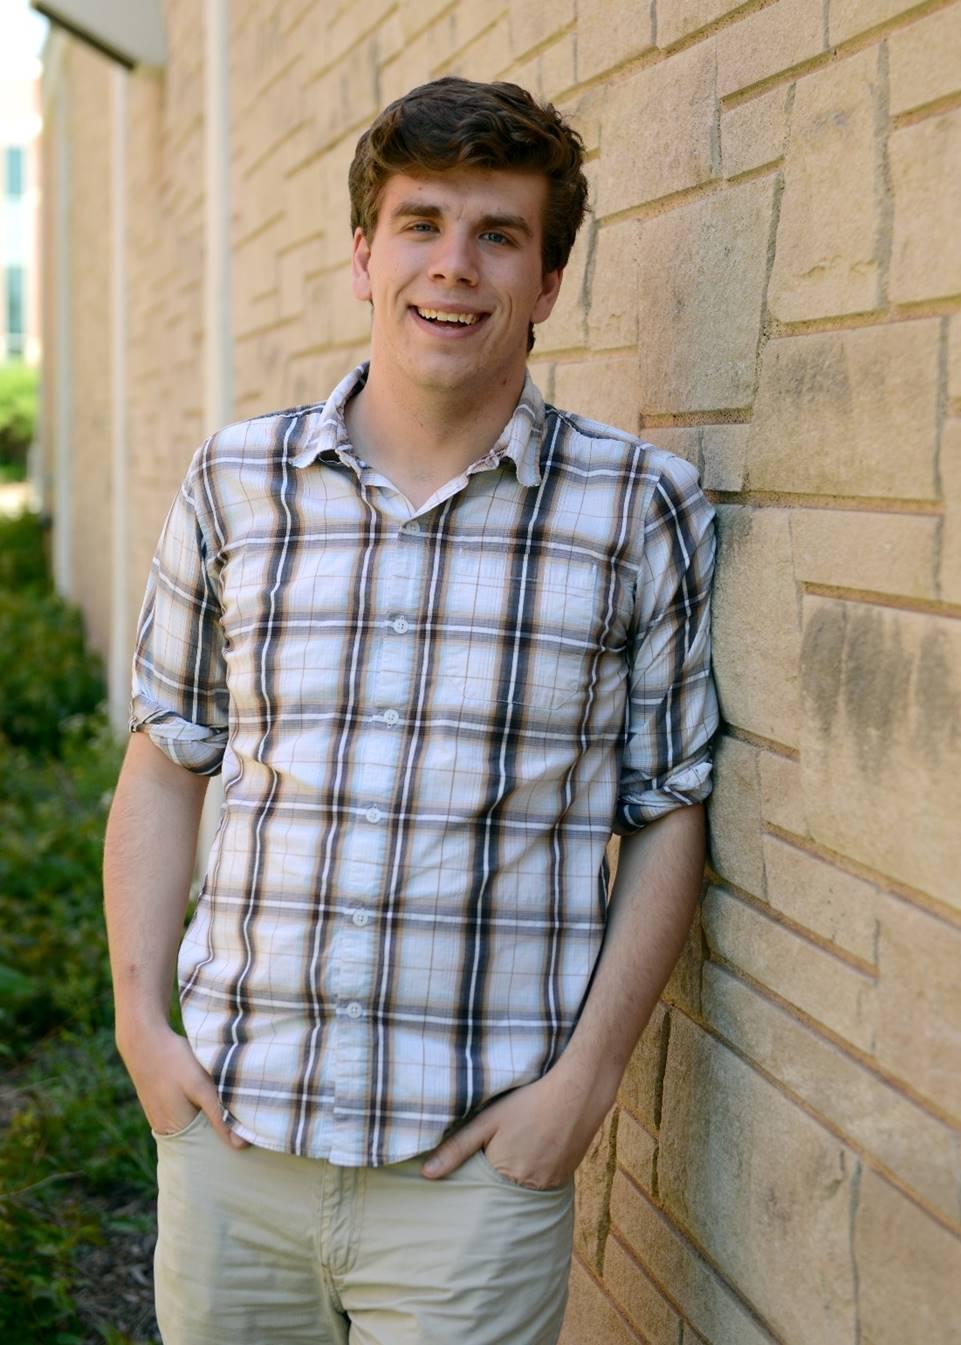 Jon Mehlhaus - Interning: Hilltop UMC (Mankato) with Rev. Kelly McCuaigSchool: Grinnell College (Grinnell, Iowa)Home church: Eden Prairie UMC